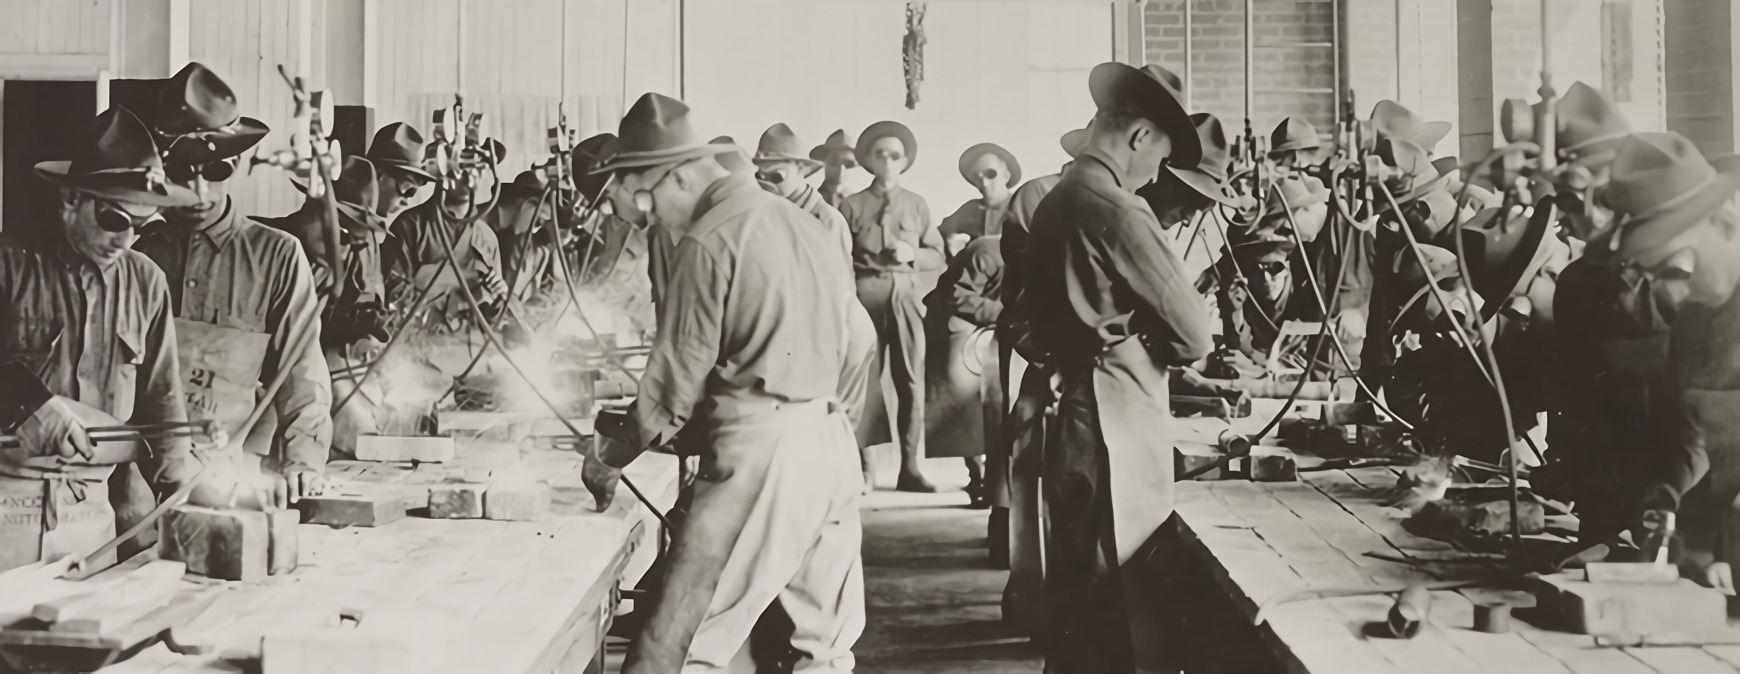 soldiers recieving welding training